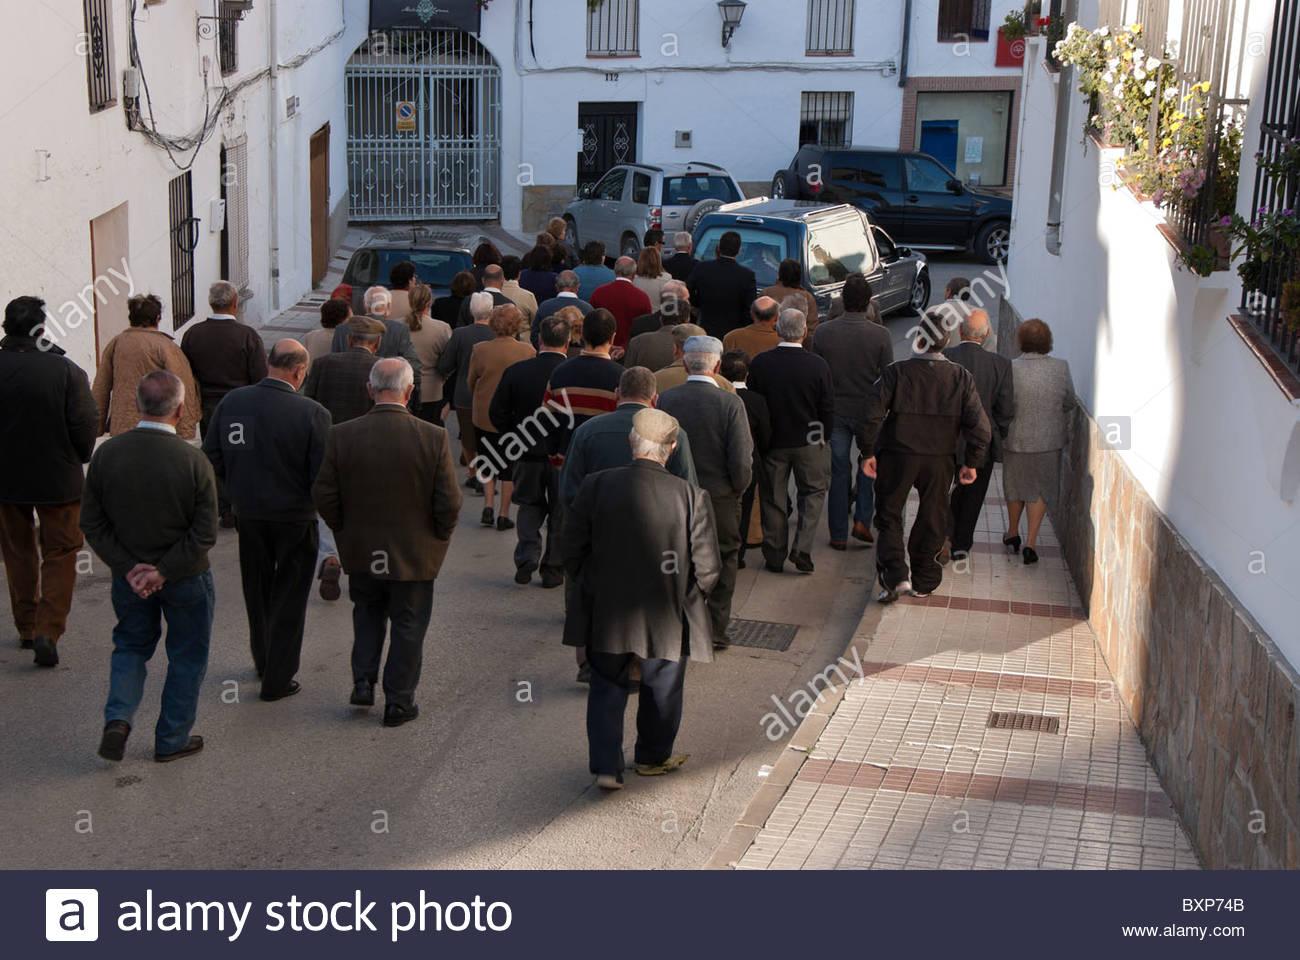 mourners-walk-behind-a-hearse-down-a-qui